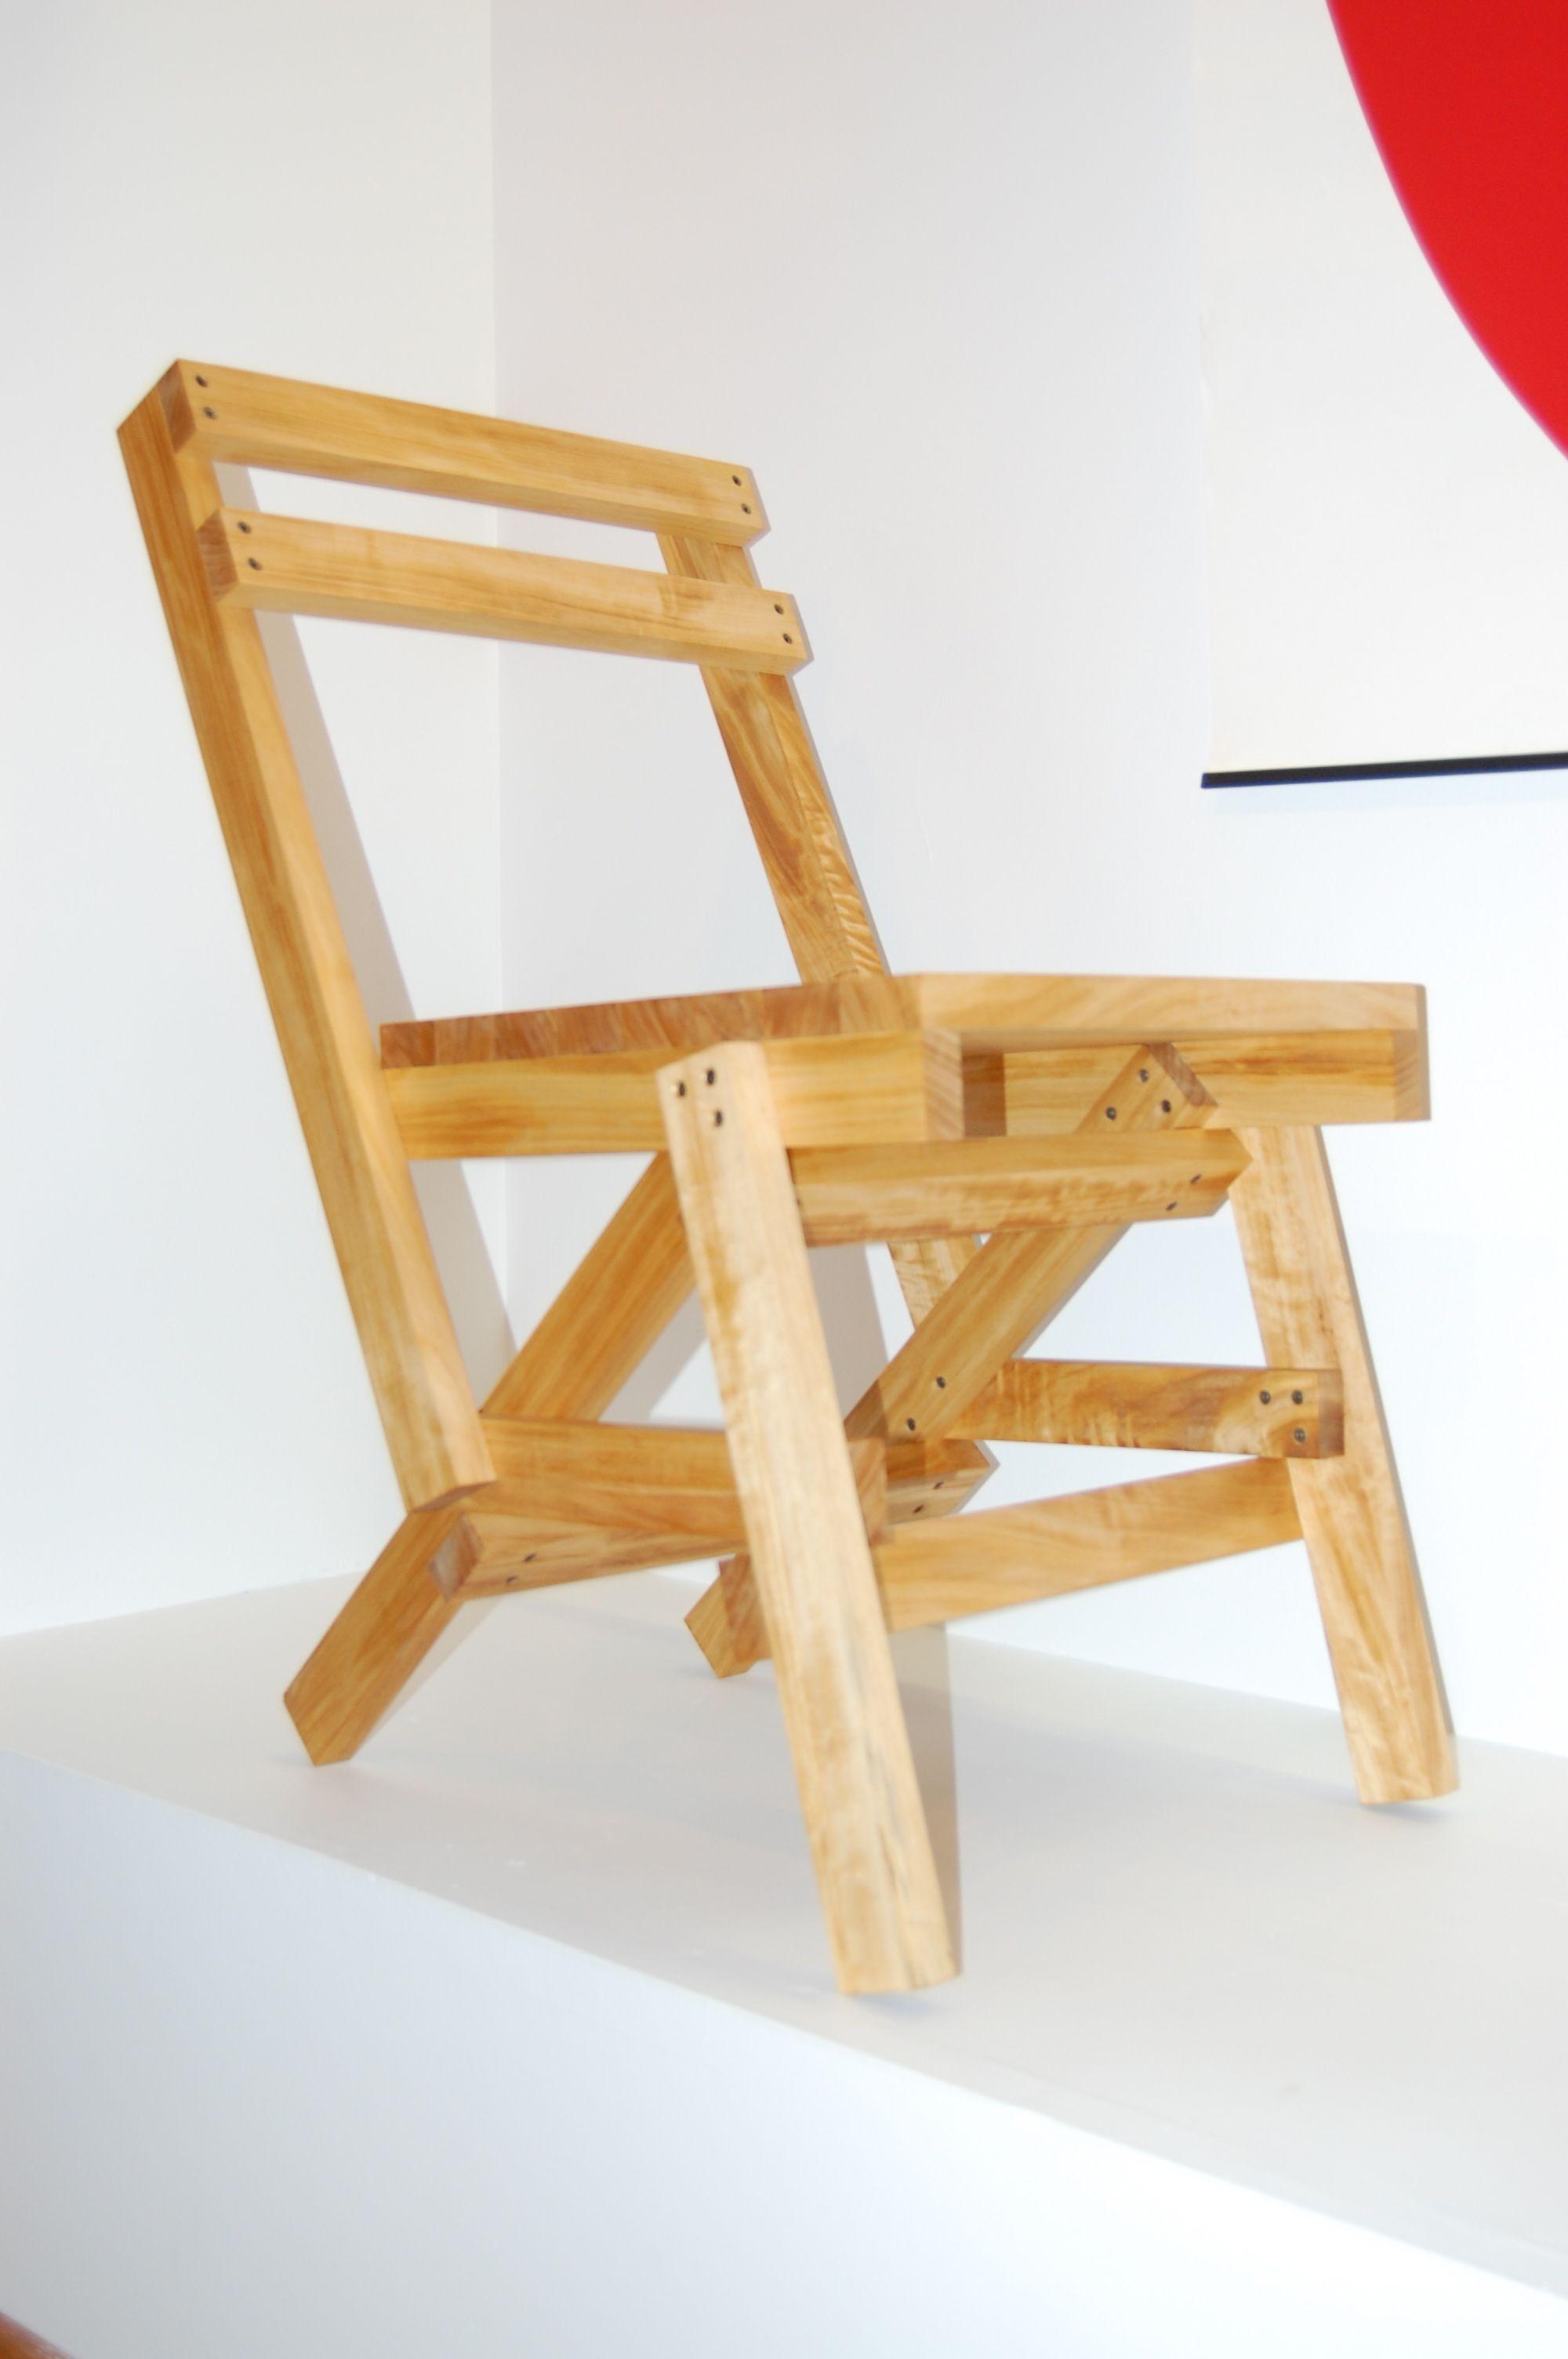 autopro tazione enzo mari Cerca con Google Wood Chairs Stools and Tables Pinterest